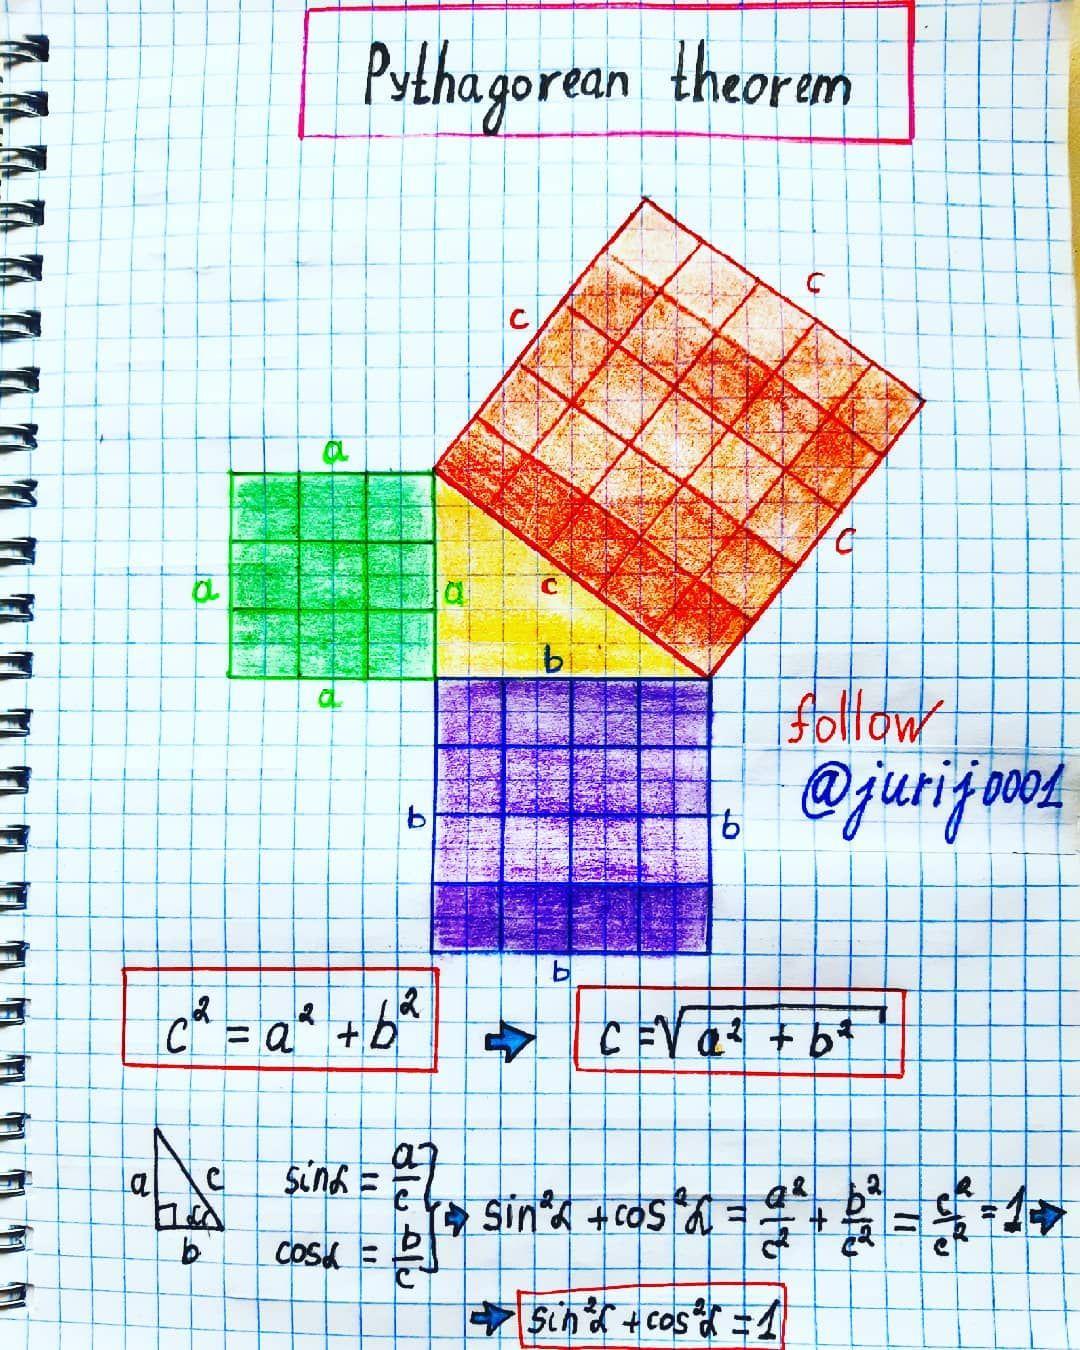 pythagorean theorem Illustration by Physics Teacher